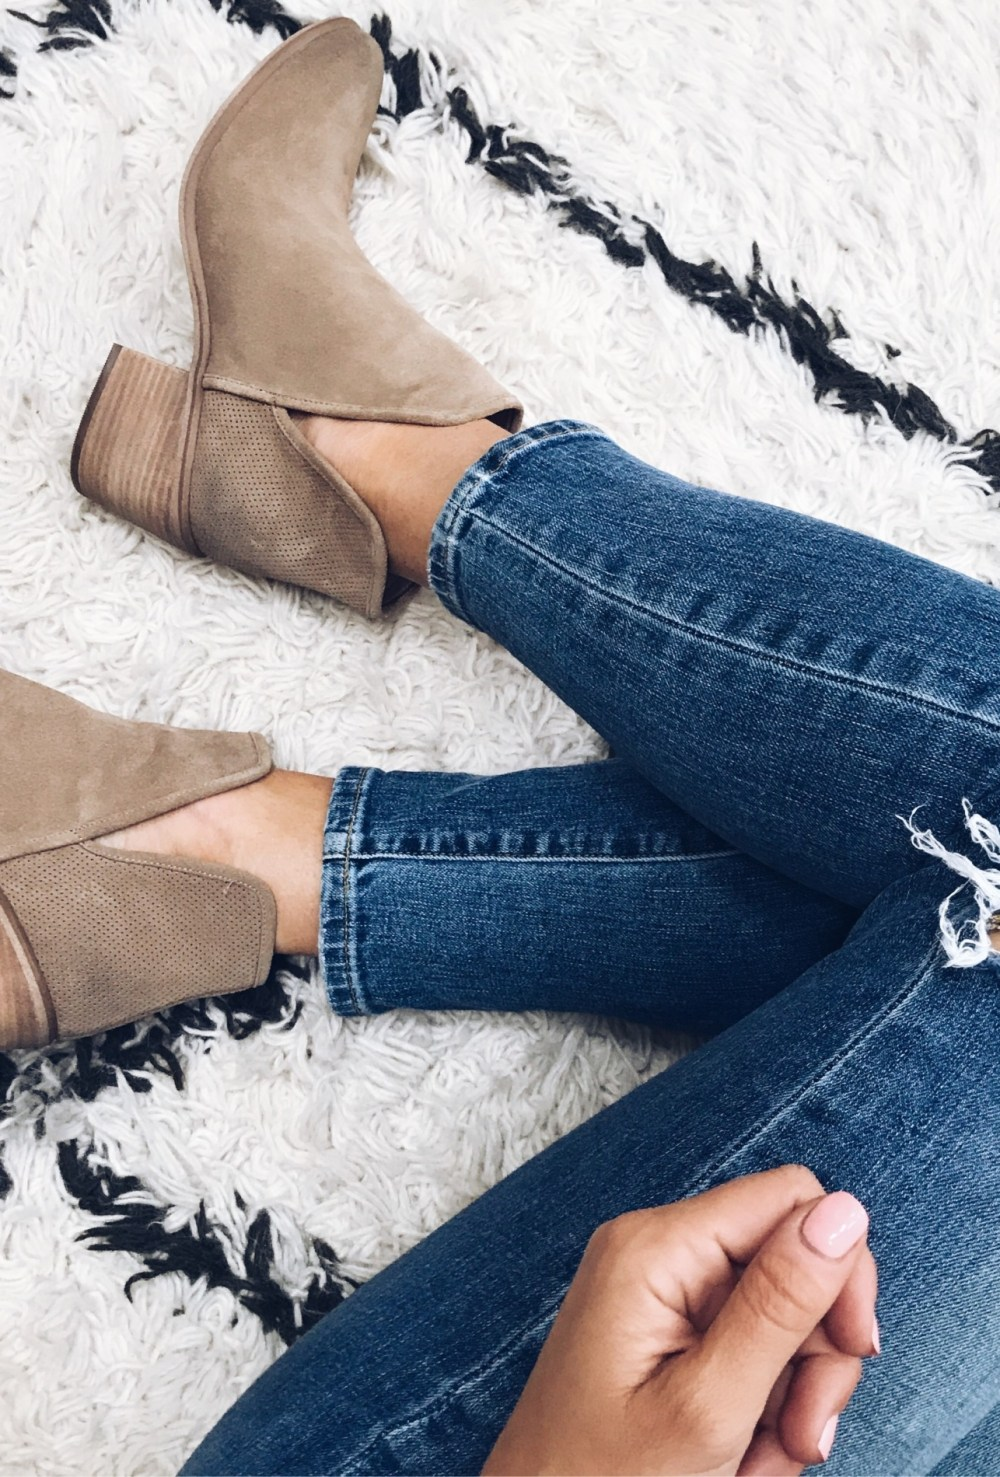 Nordstrom Shoe Picks!